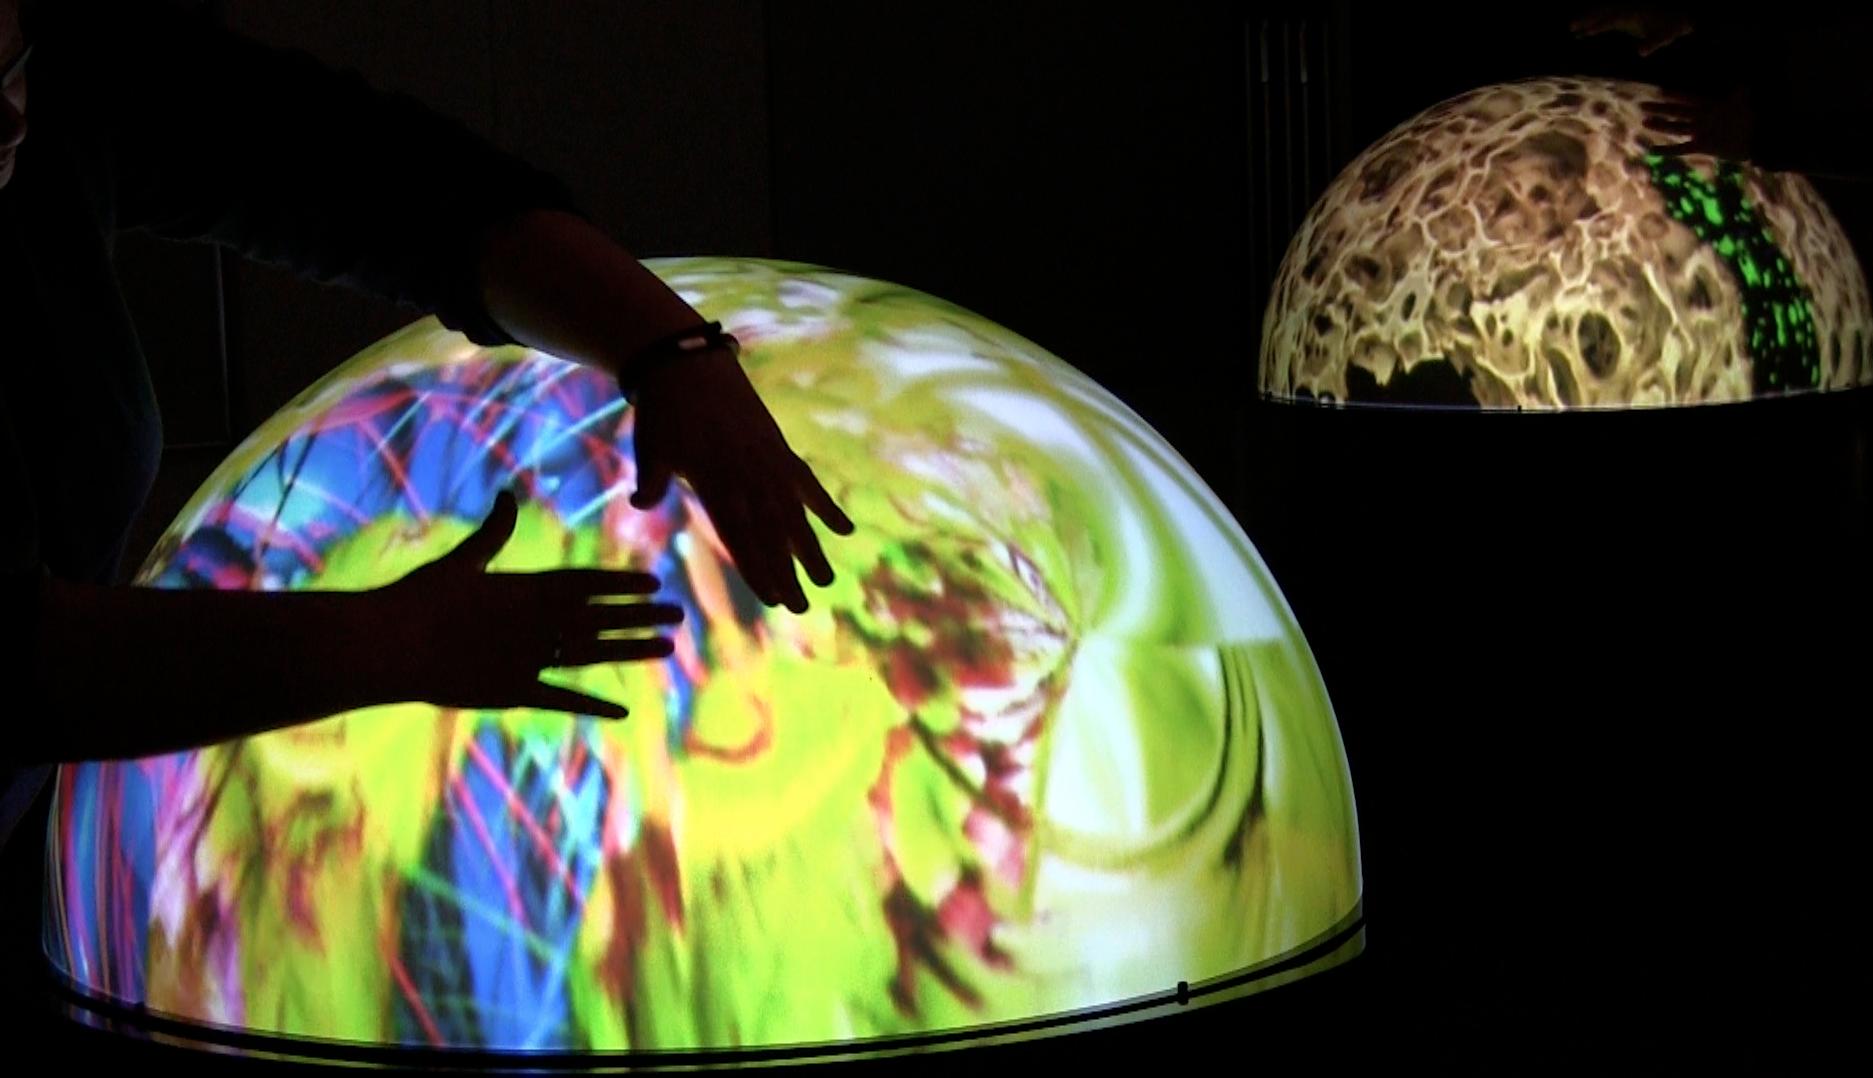 StellrLume Domes (StellrScope Project) by Eleanor Gates-Stuart